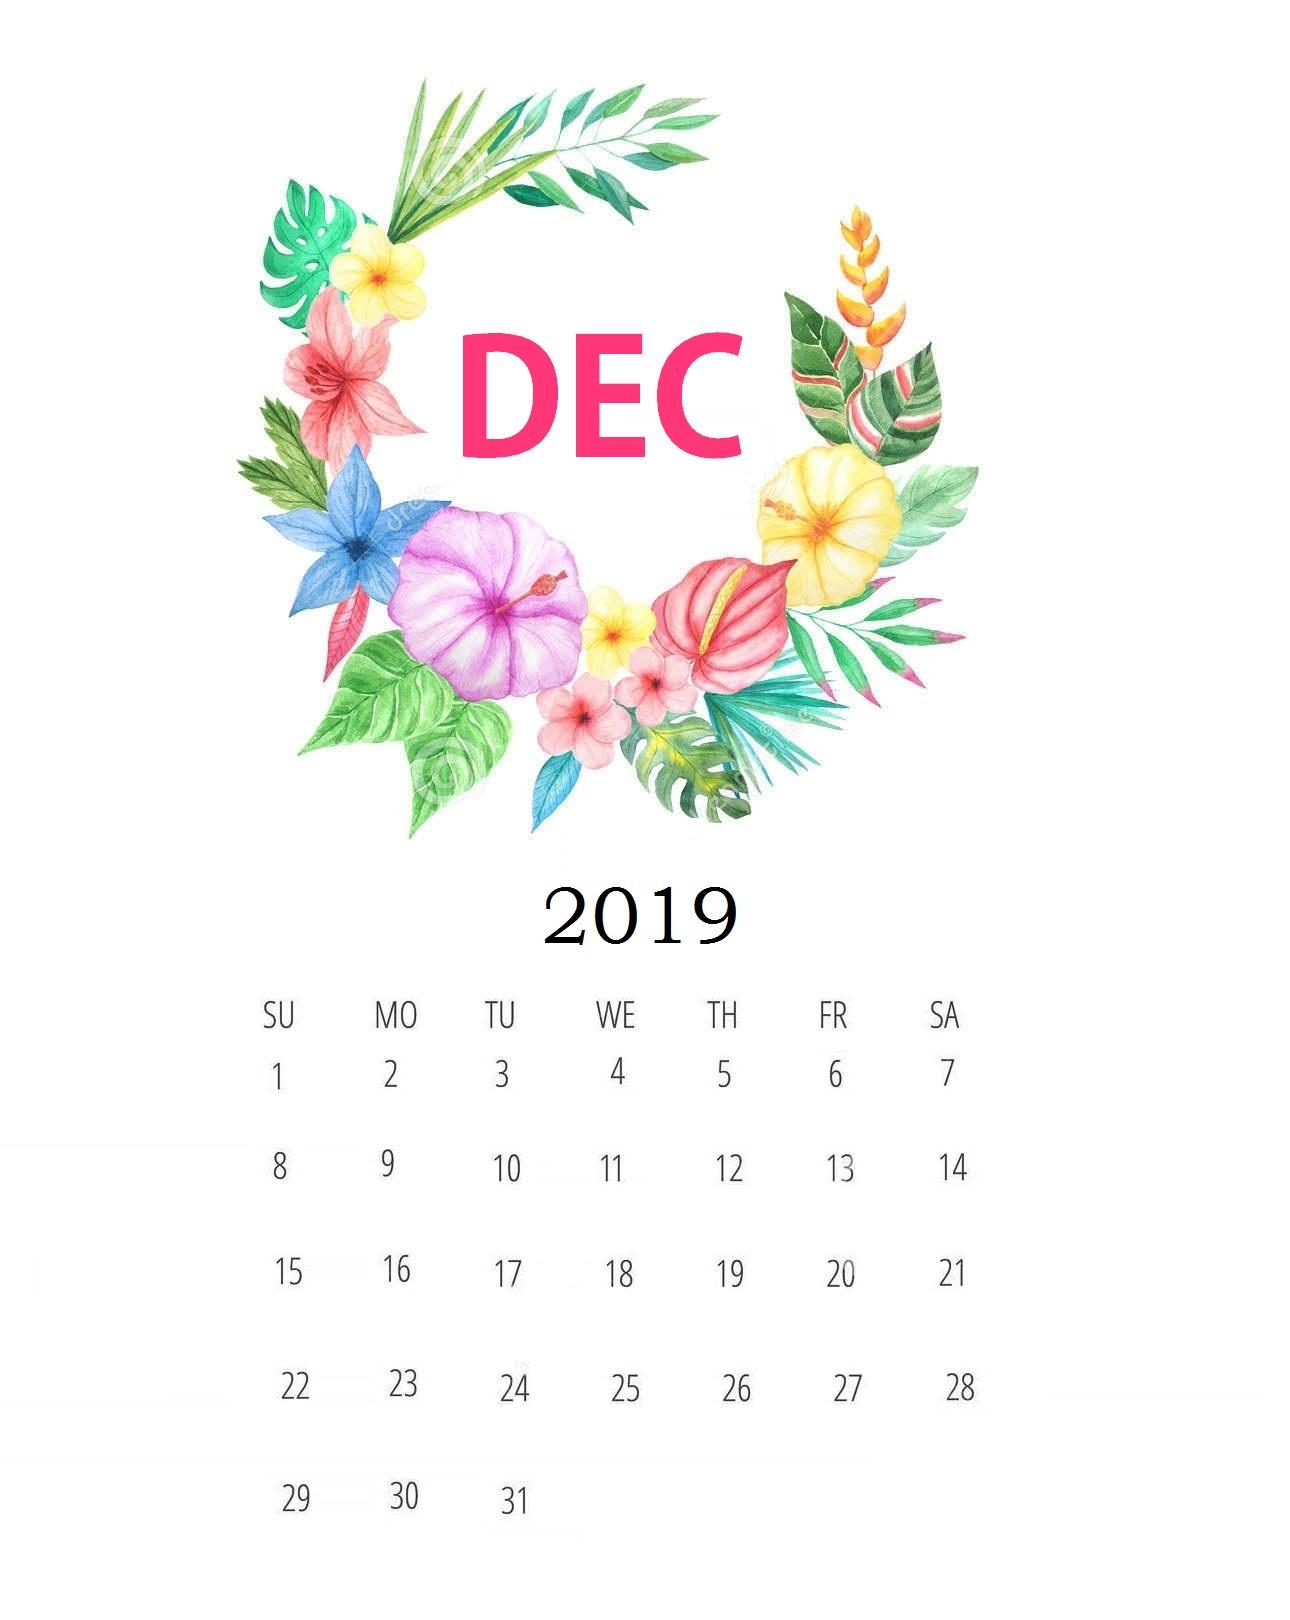 Floral December 2019 Monthly Planner